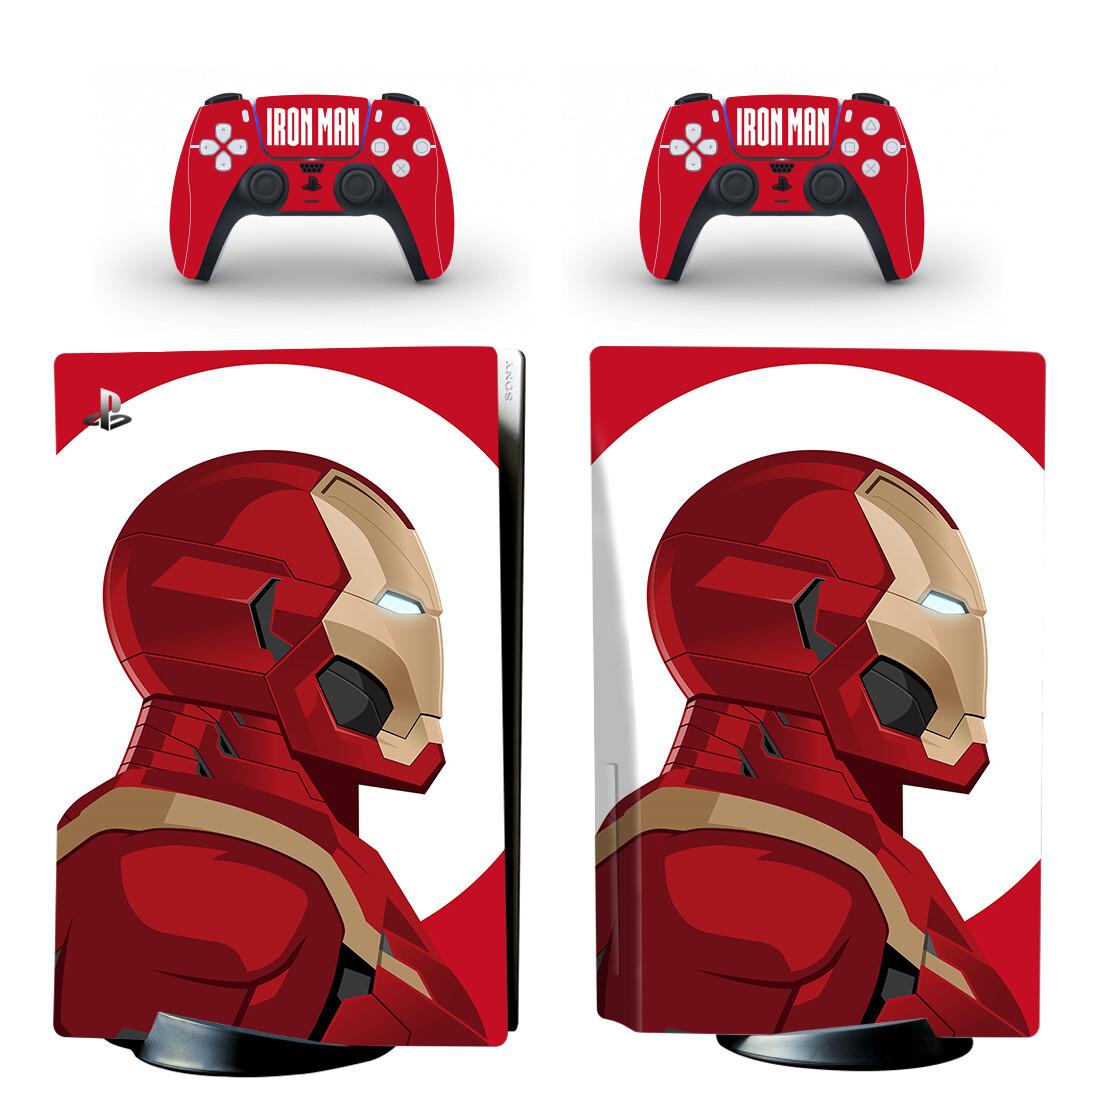 Iron Man PS5 Skin Sticker Decal